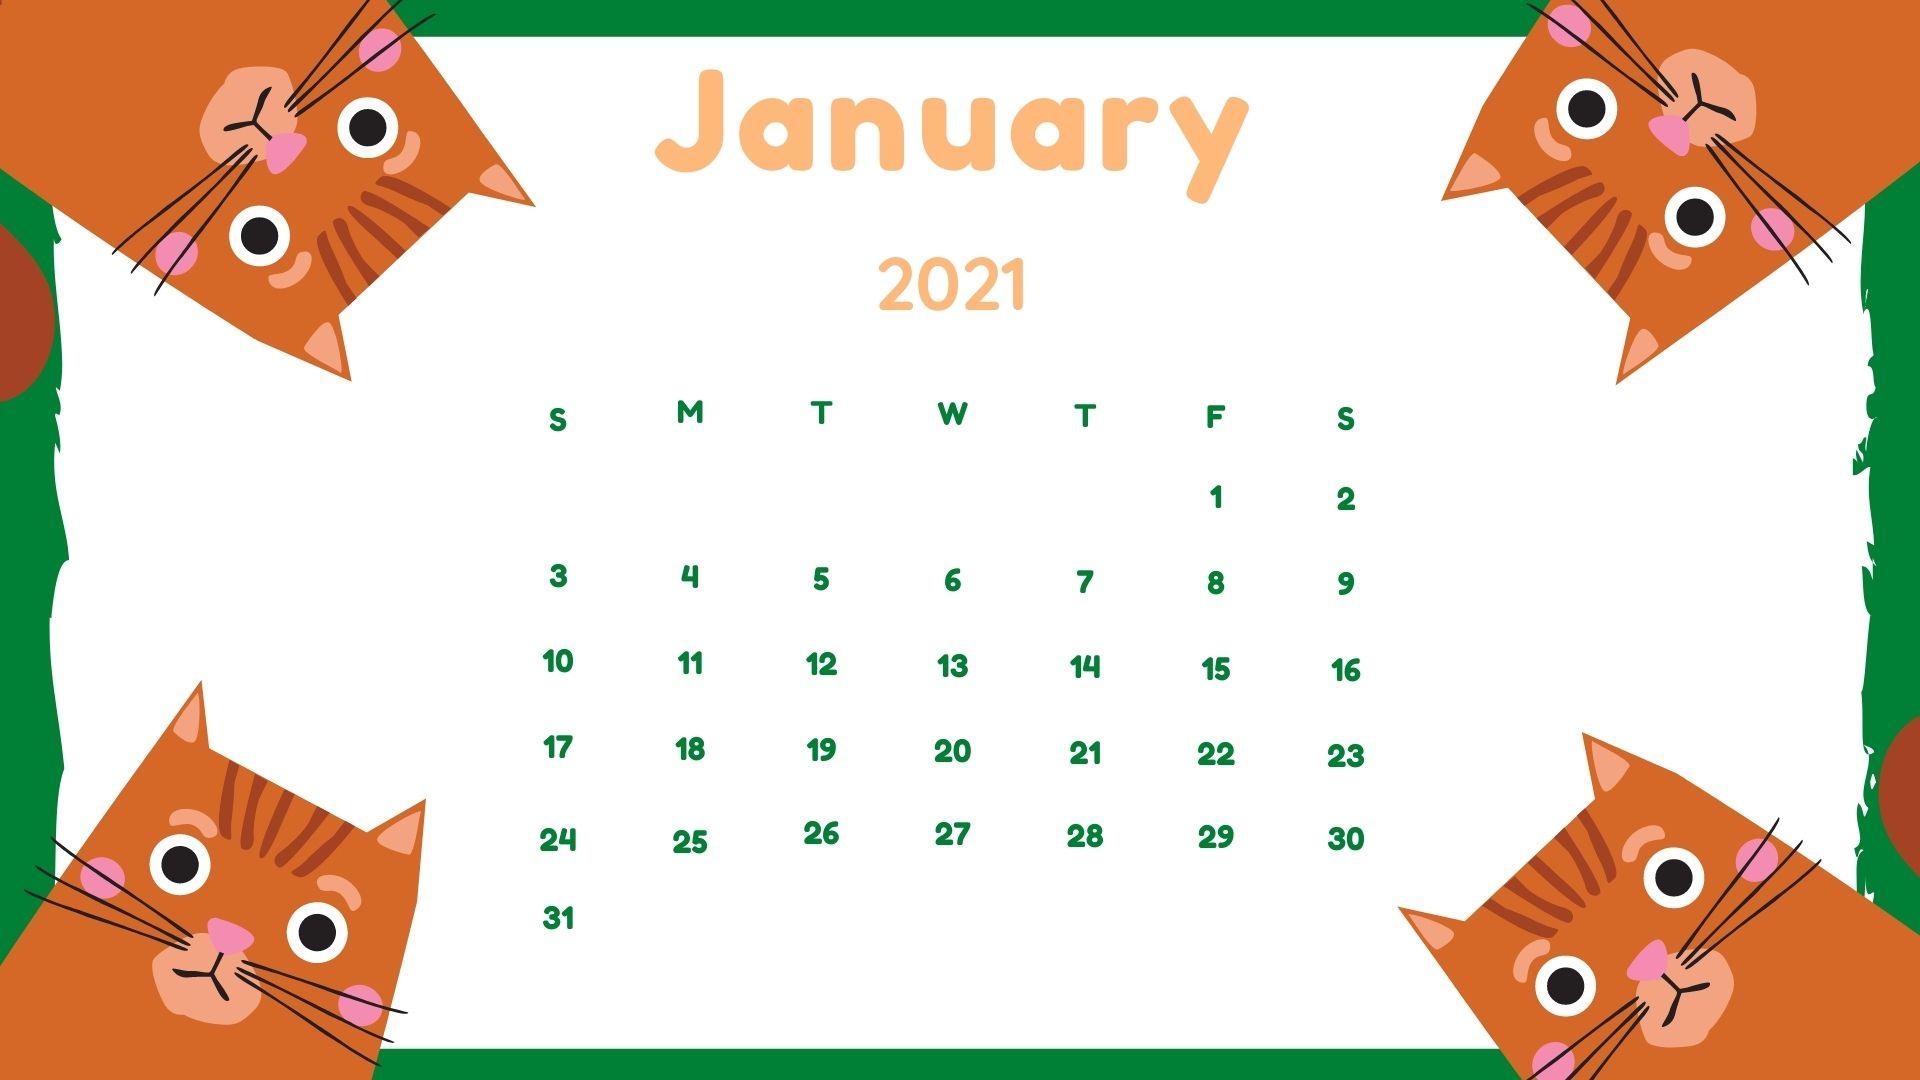 January 2021 Calendar Wallpapers Download Calendar 2021 1920x1080